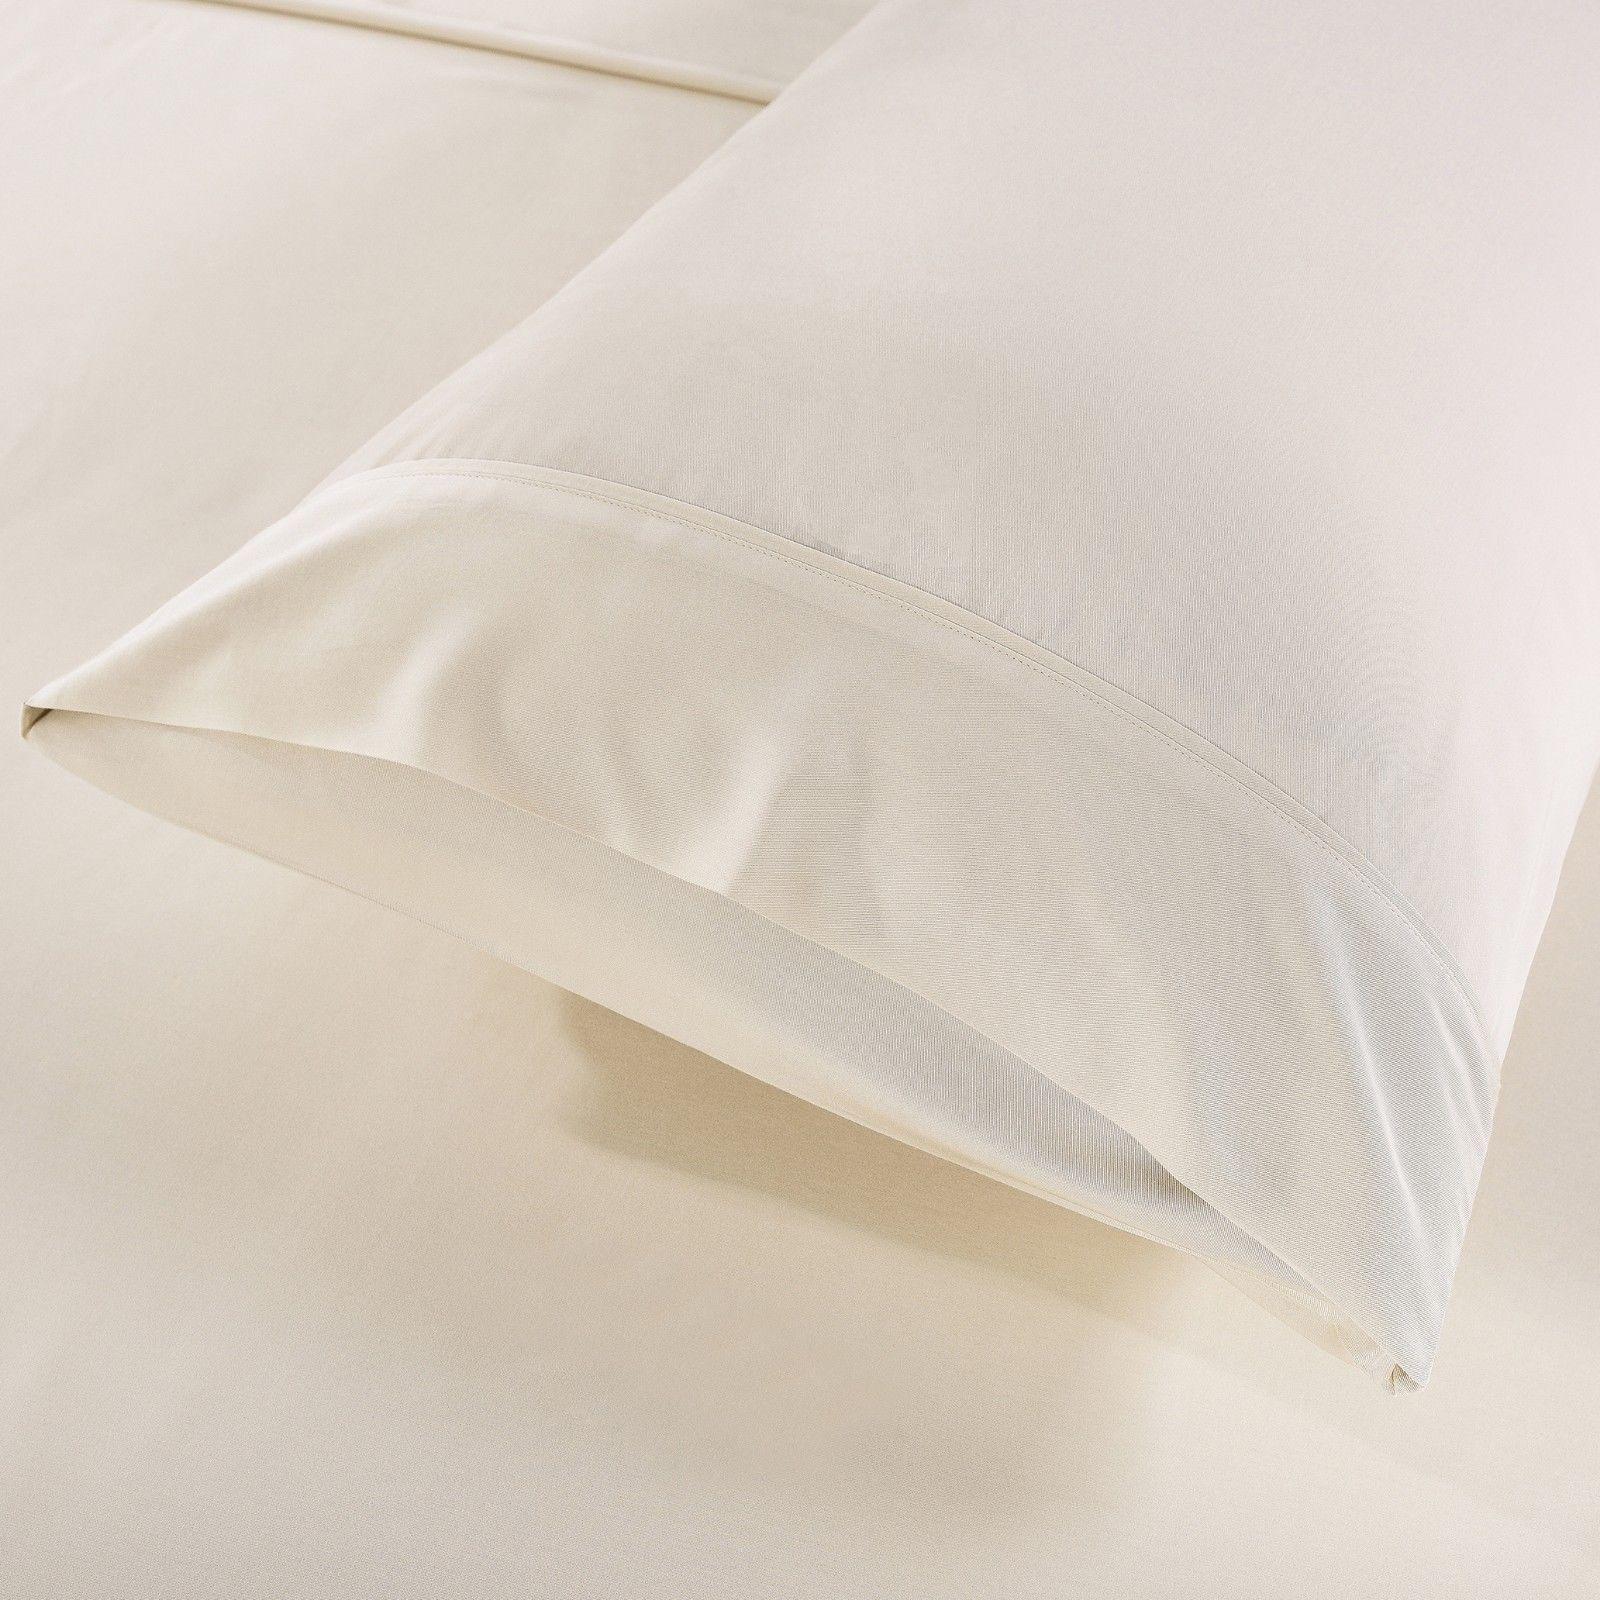 Royal-Comfort-Bamboo-Blended-Sheet-amp-Pillowcases-Set-1000TC-Ultra-Soft-Bedding thumbnail 20